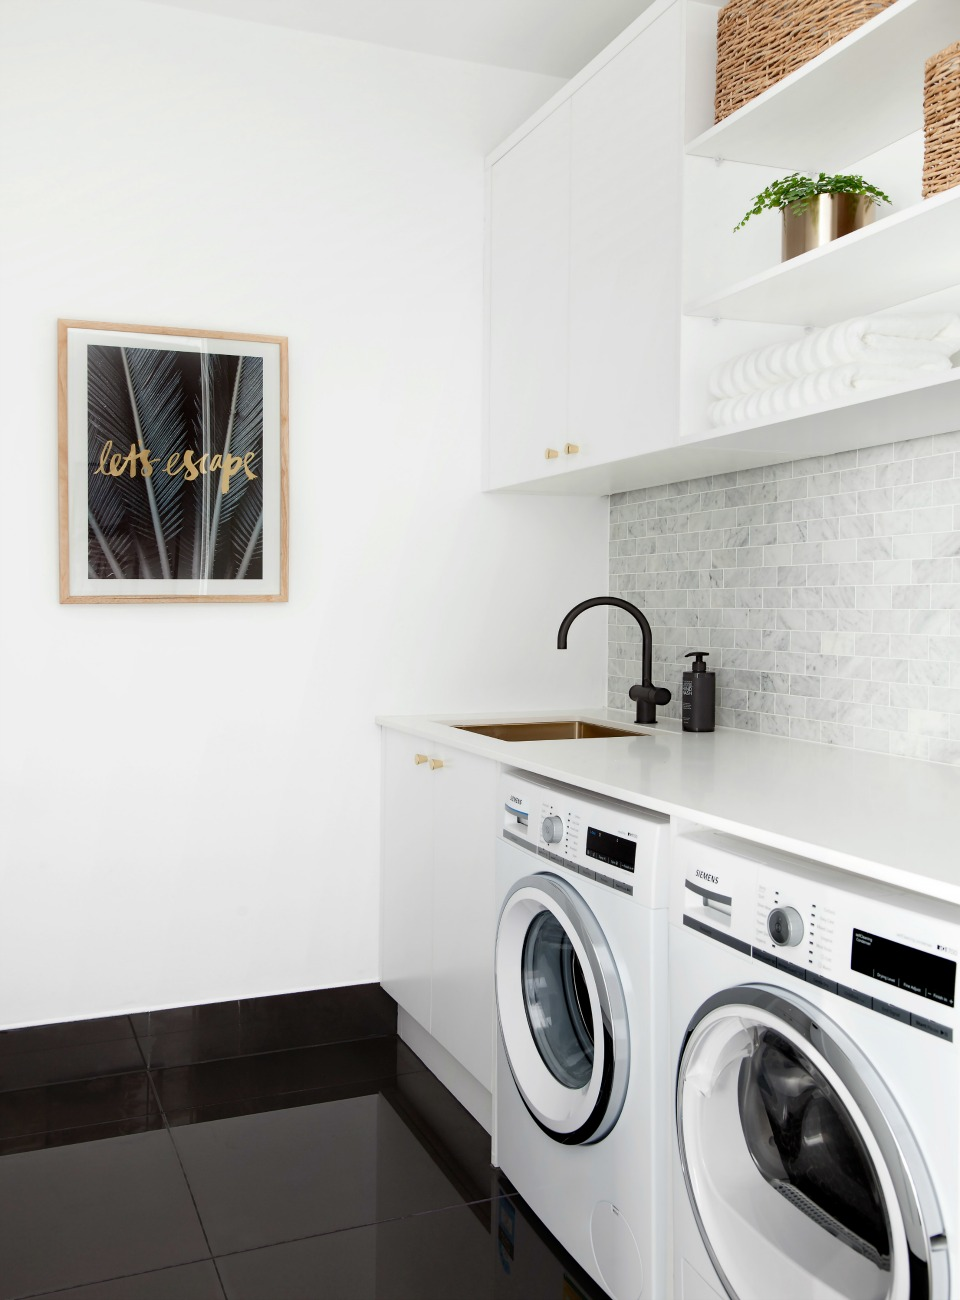 Darren Palmer S Top Laundry Design Tips The Block